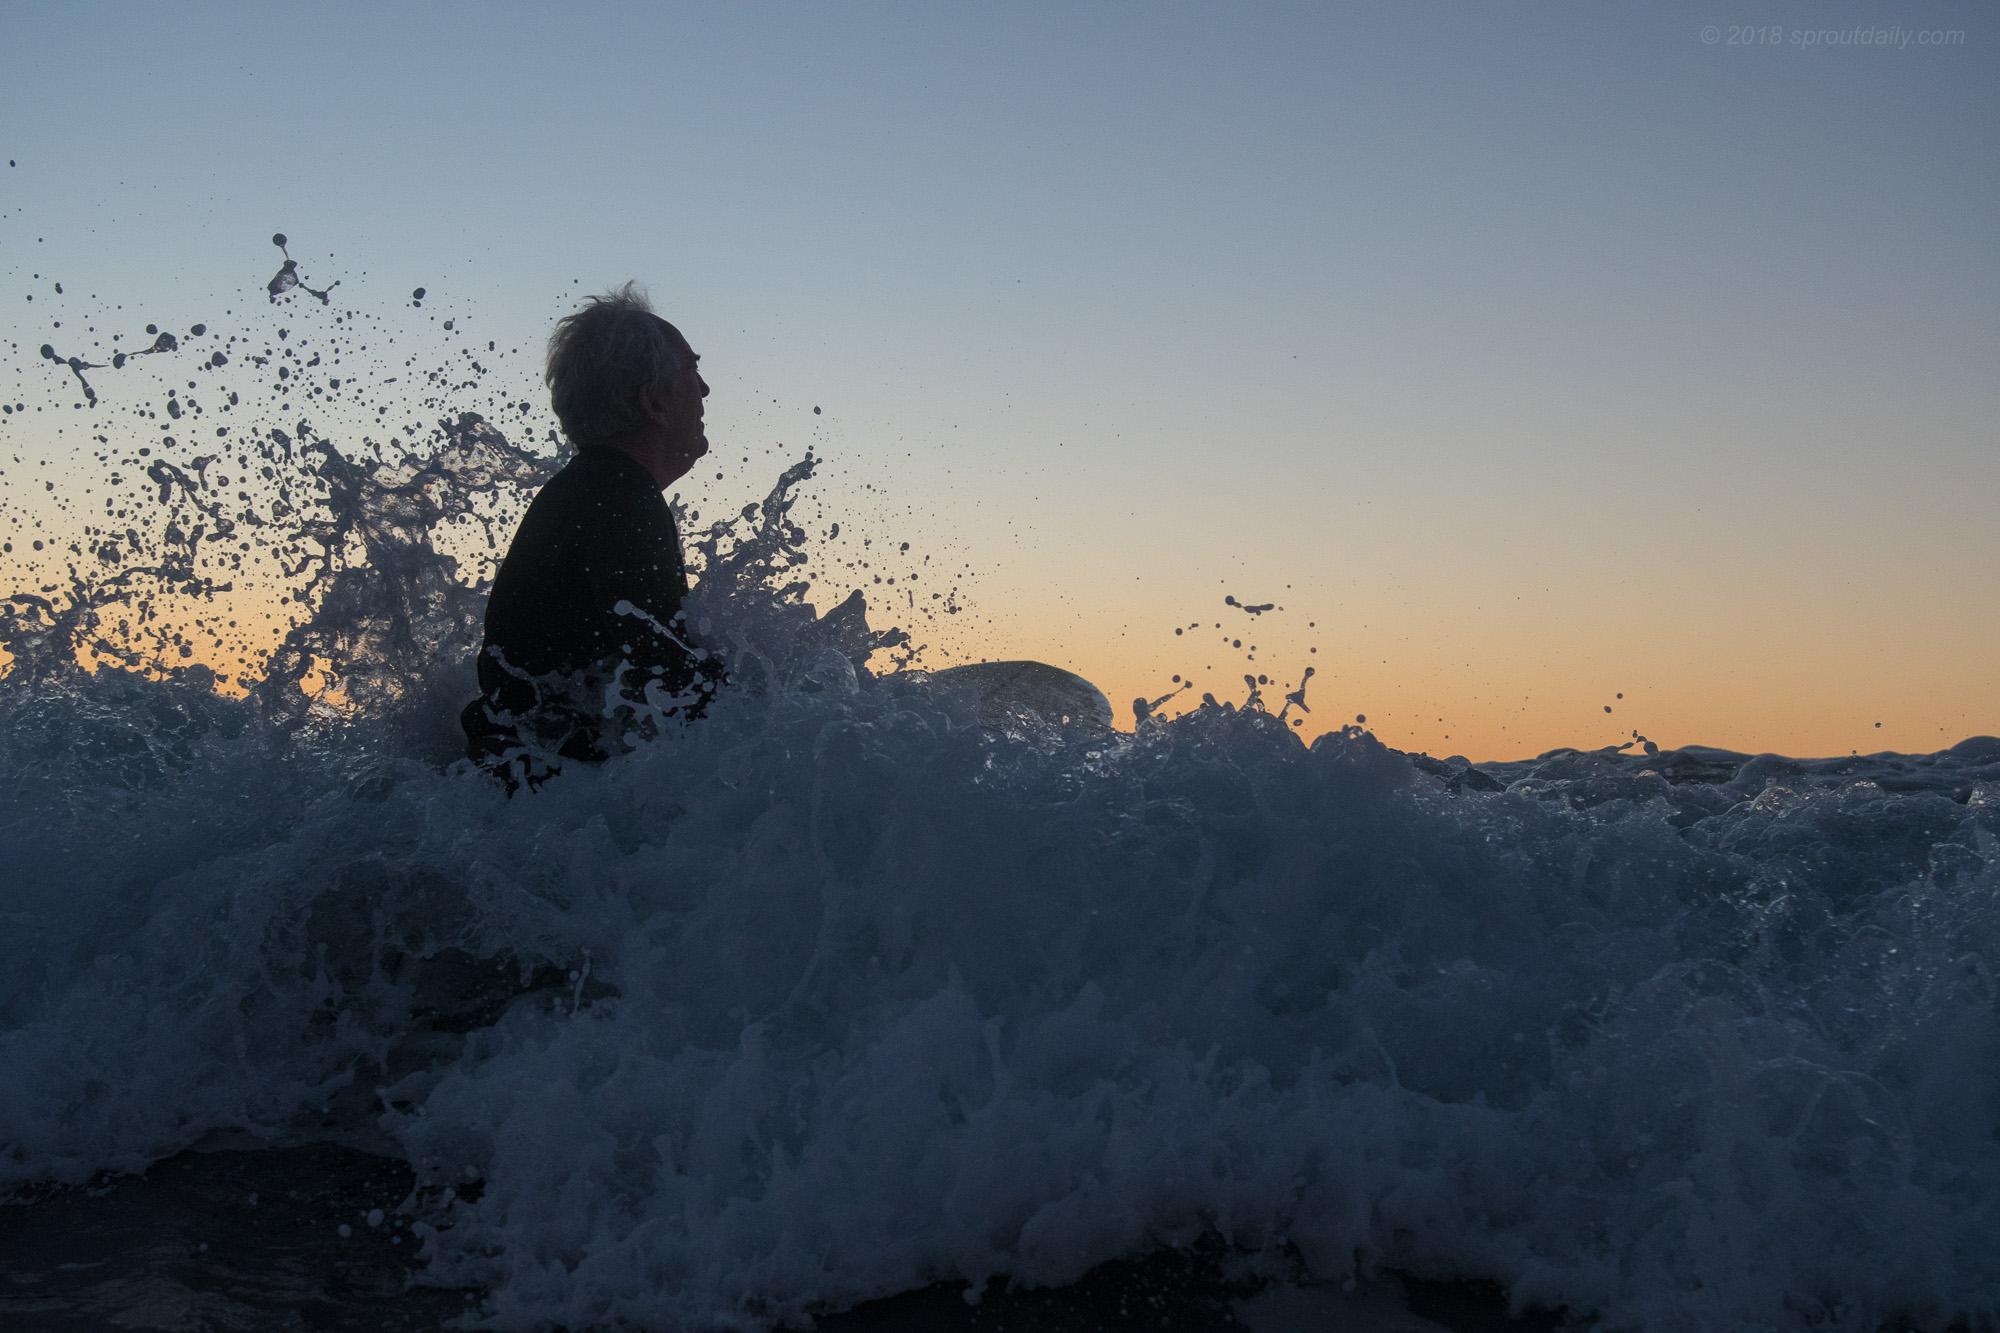 The first splash feeling...